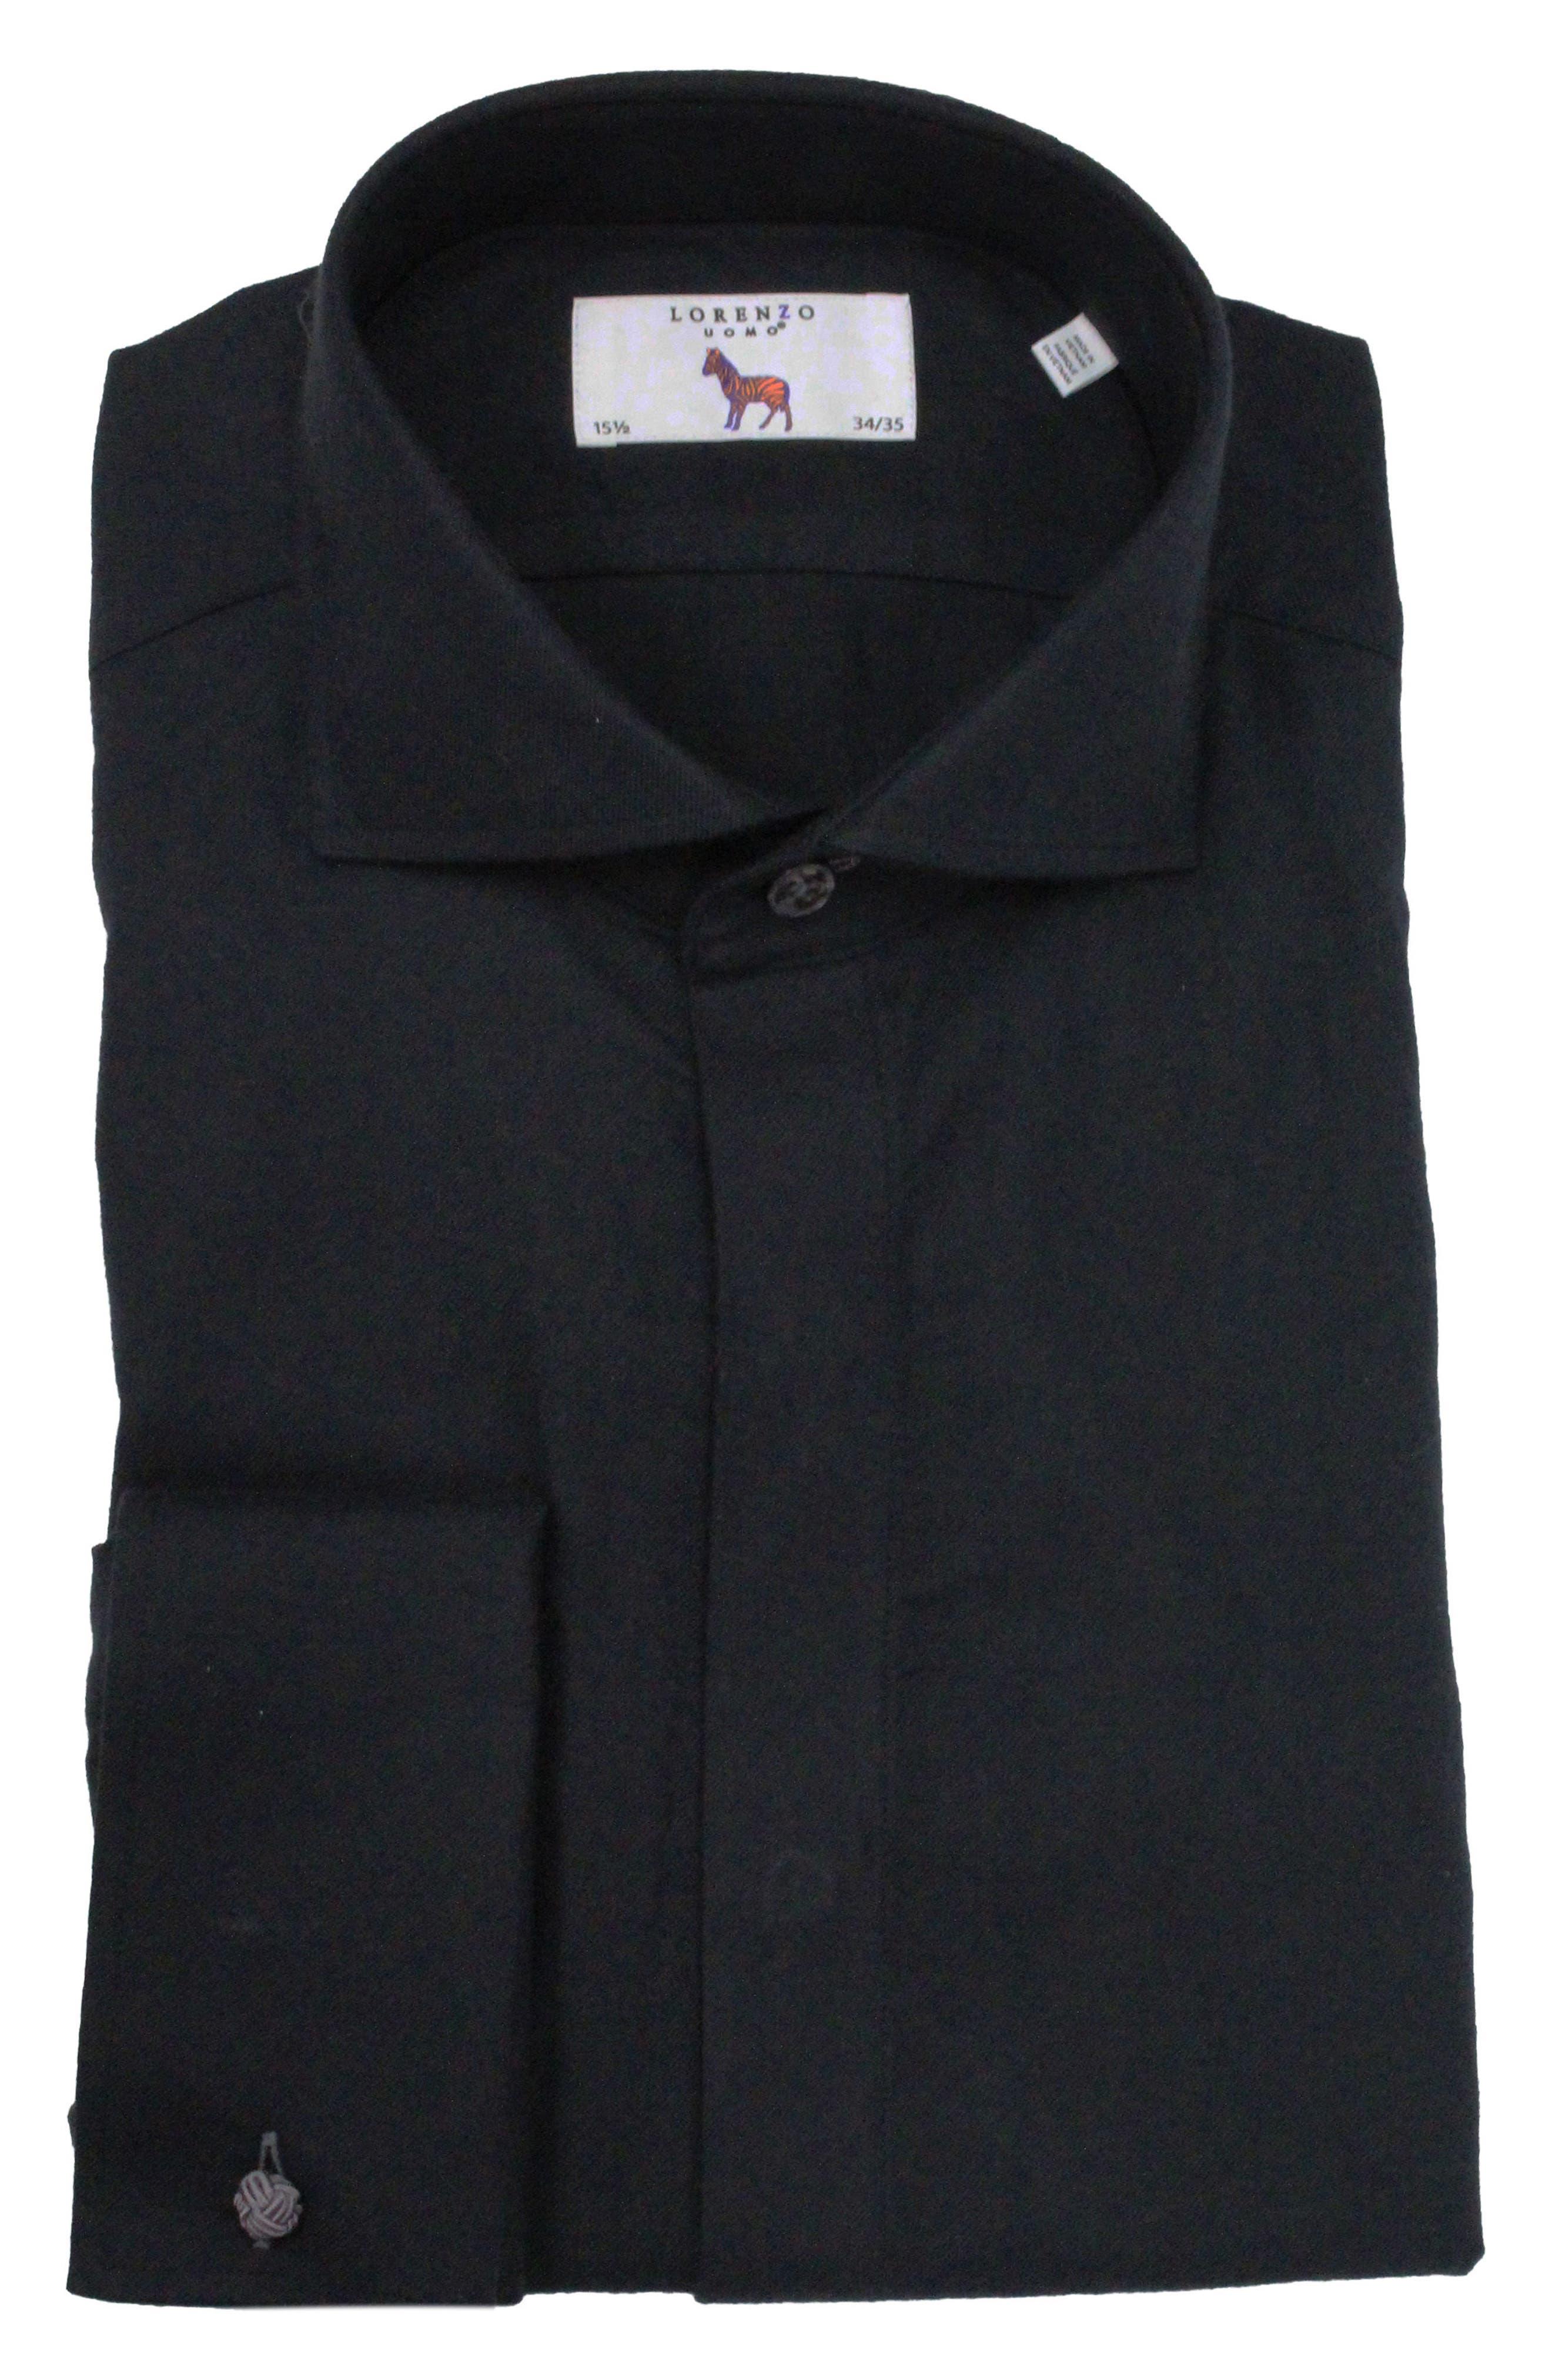 Main Image - Lorenzo Uomo Trim Fit Tuxedo Shirt